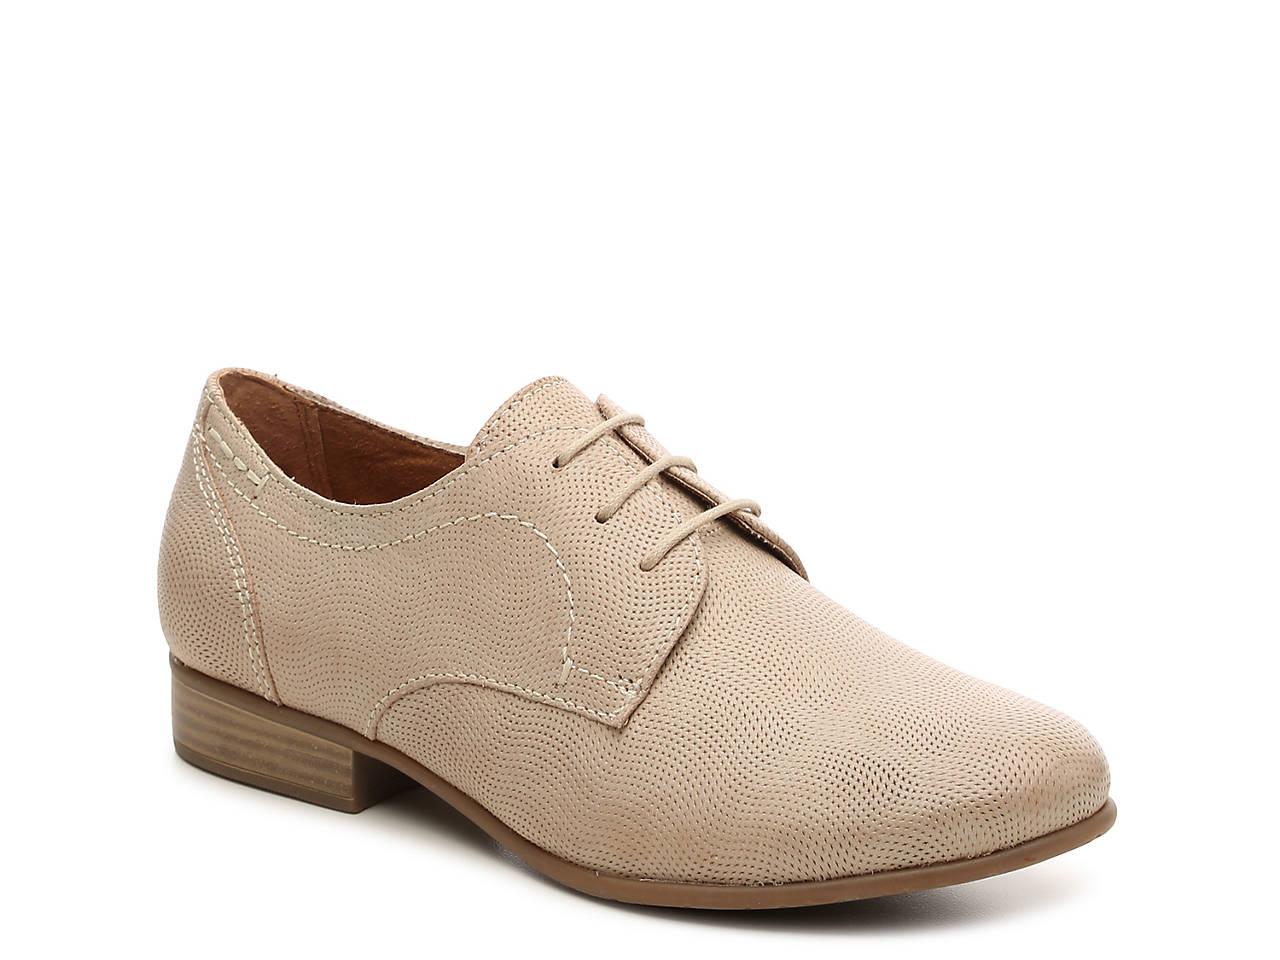 5d30a80ddca35b Tamaris Leather Oxford Women's Shoes   DSW